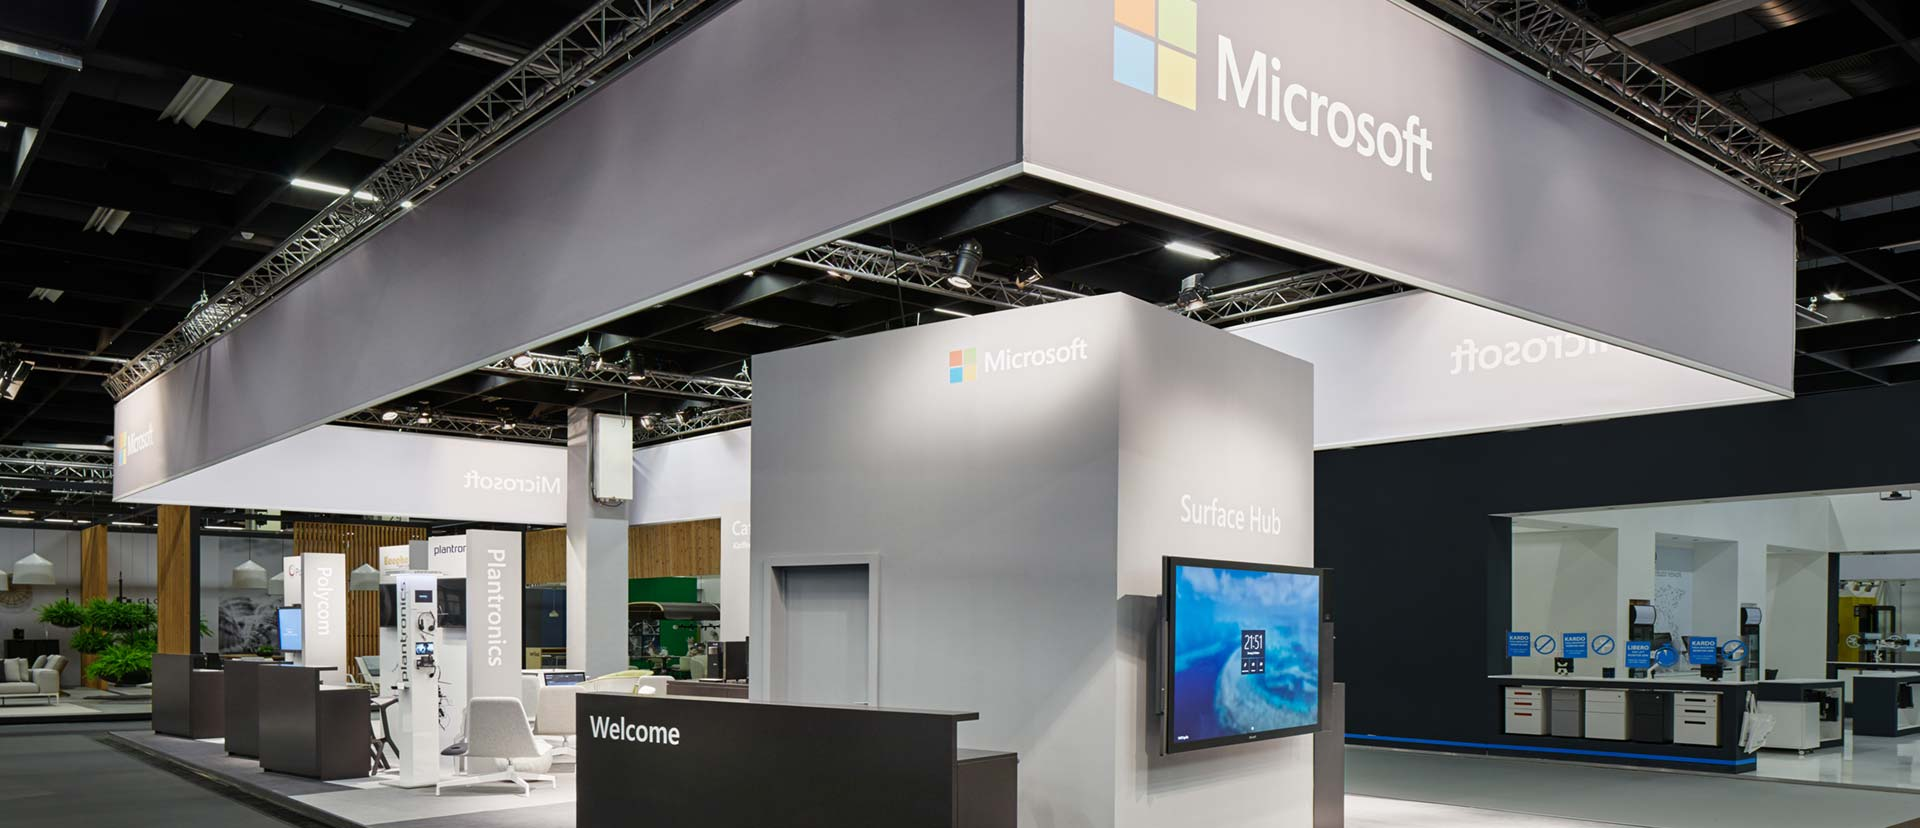 Microsoft Slider 1920x828px